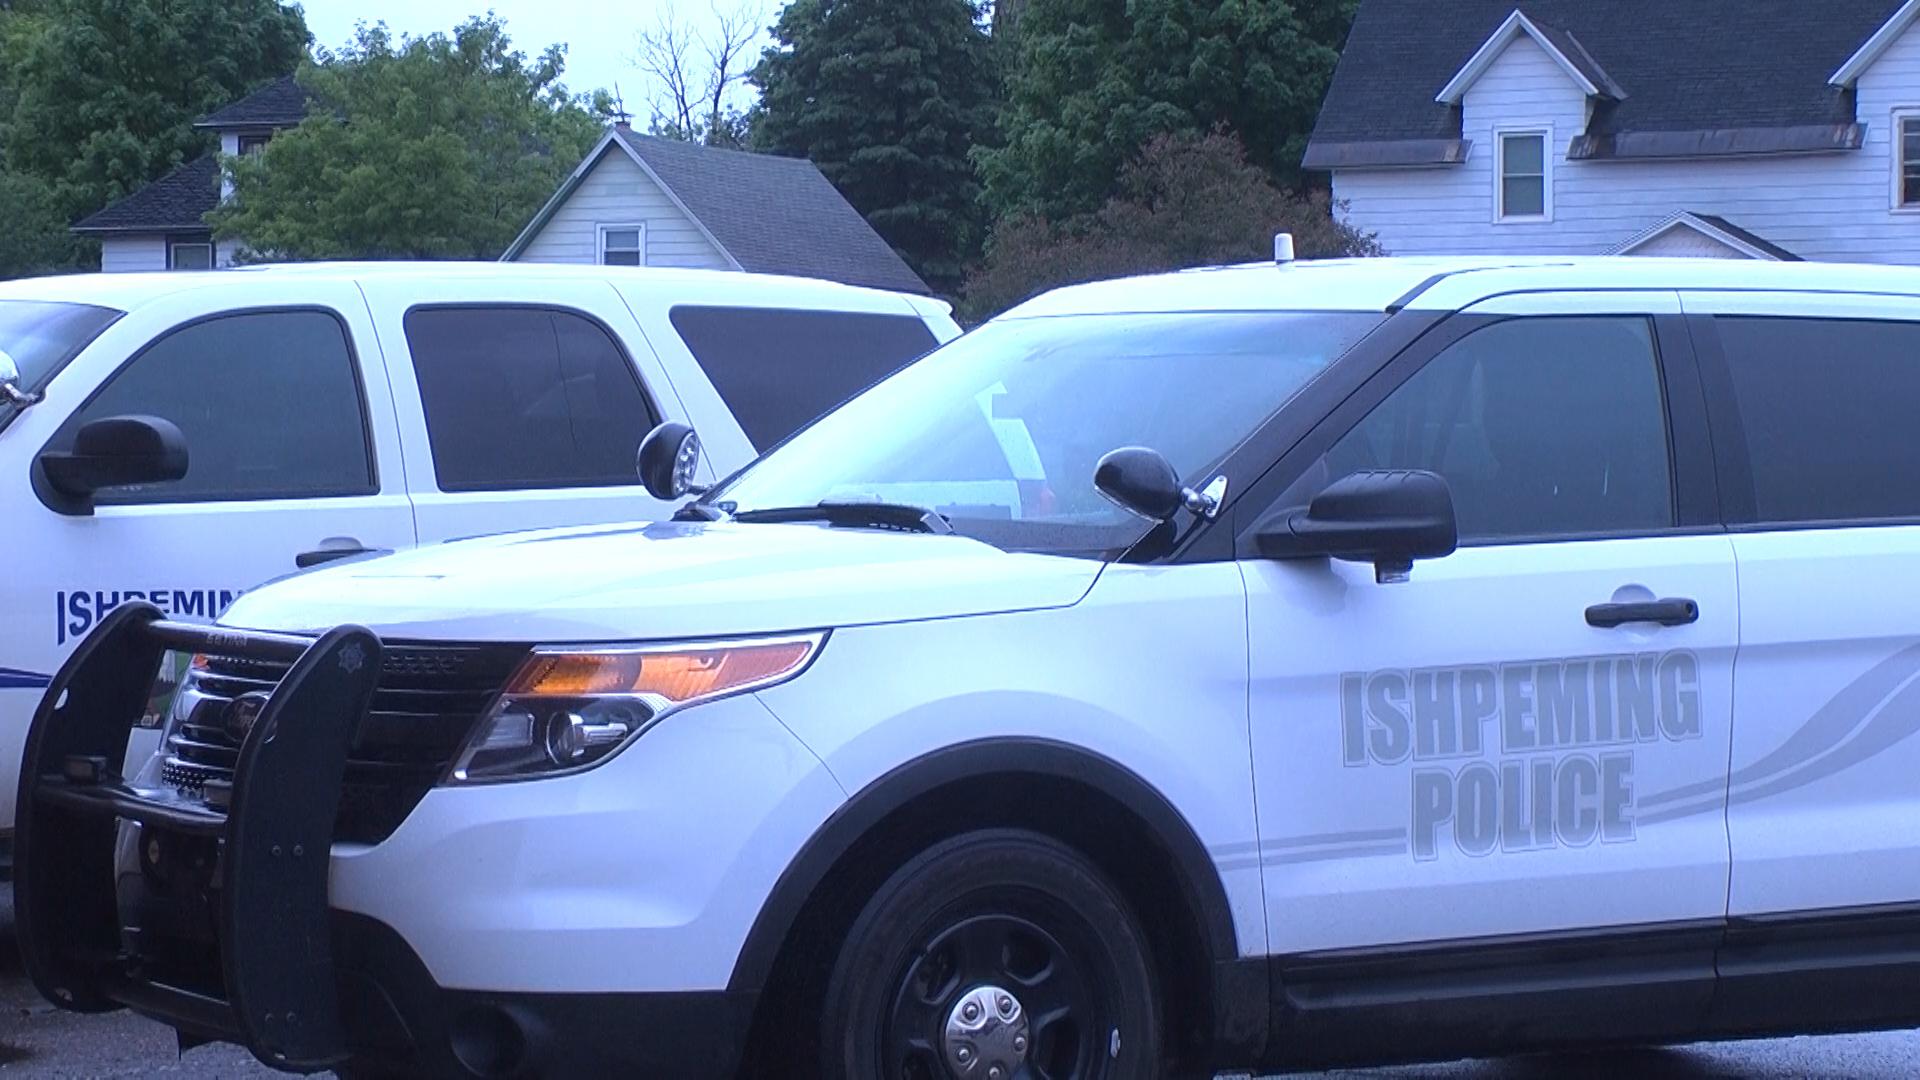 Local Police Hosting Bike Auction Abc 10 Cw 5